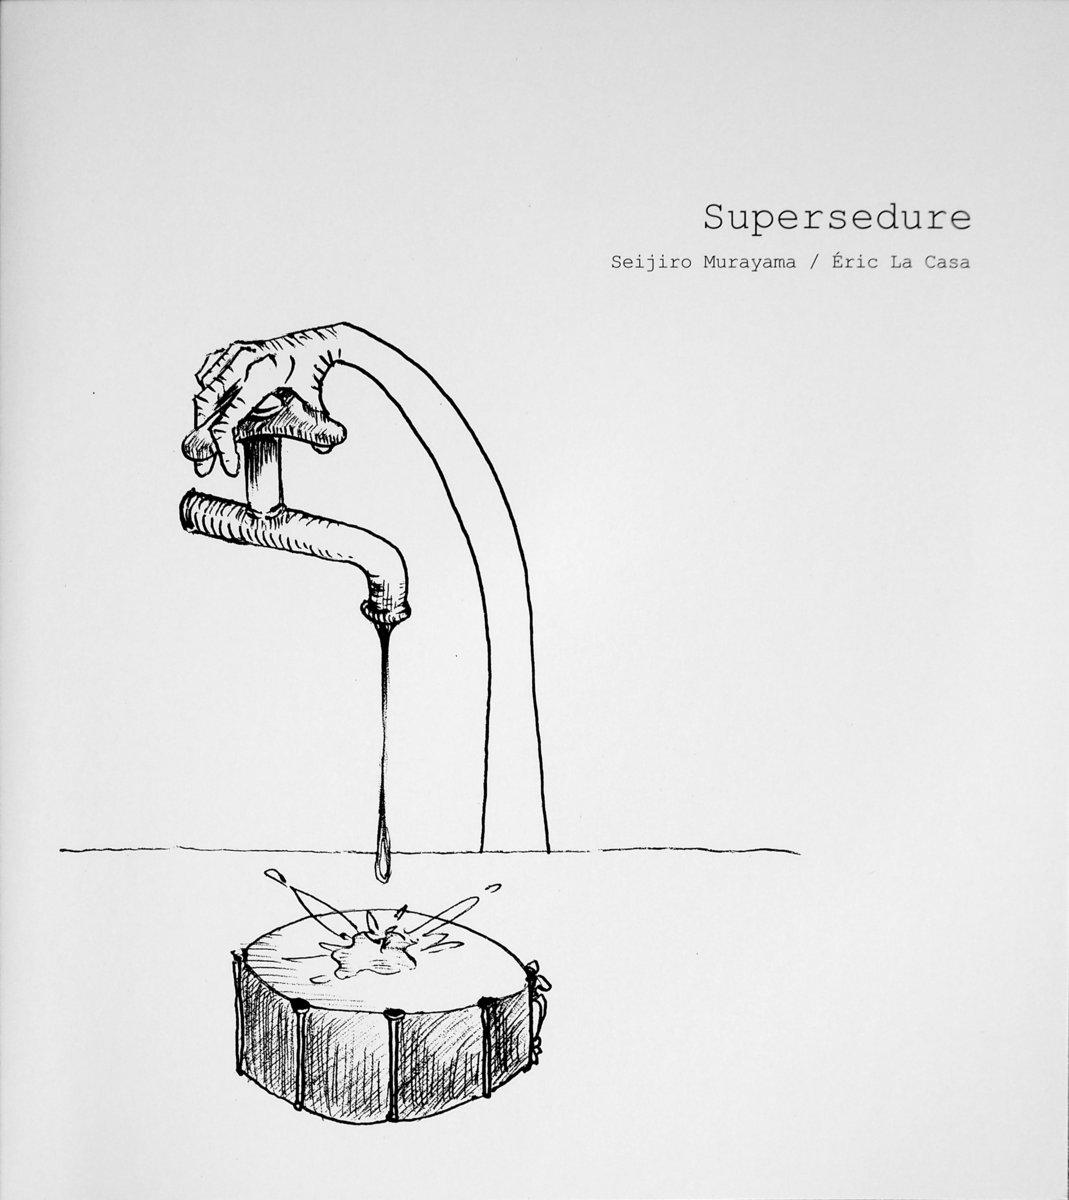 Supersedure Ric La Casa Snare Drum Parts Diagram Picture Pictures By Eric Recordings And Composition Seijiro Murayama